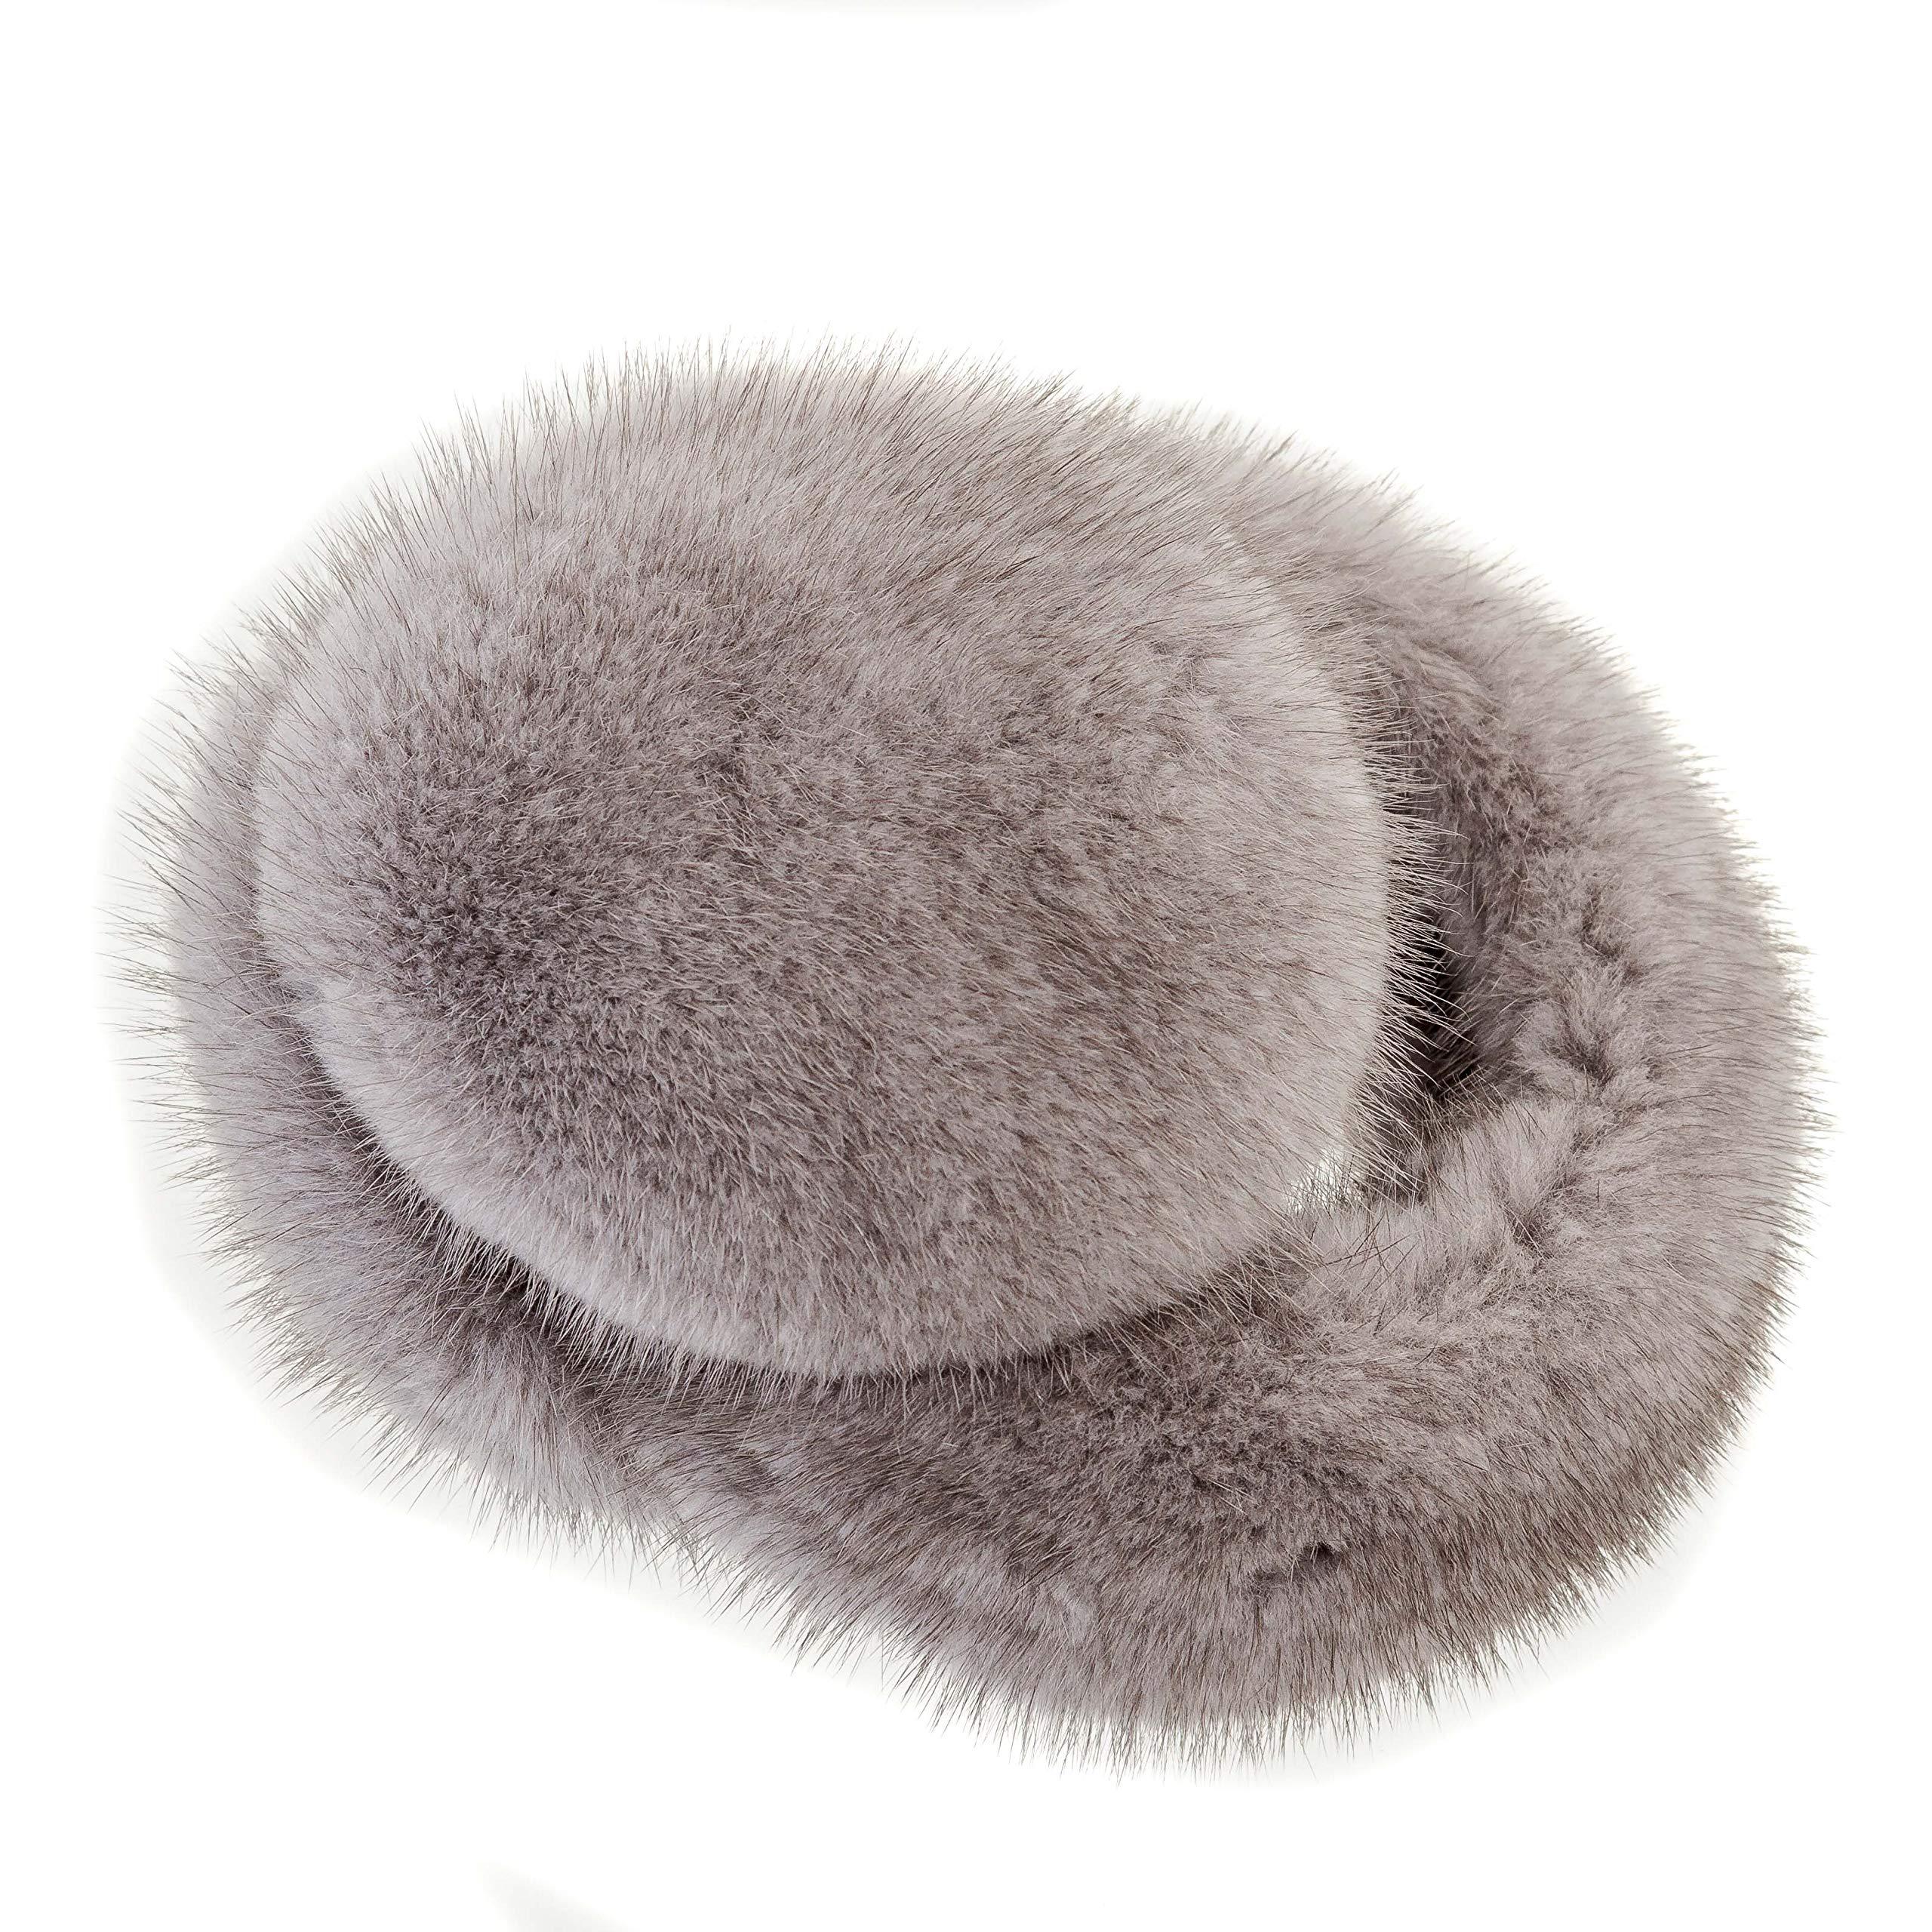 Surell Mink Earmuff with Fur Halo Band - Winter Ear Muffs - Cold Weather Fashion (Grey)